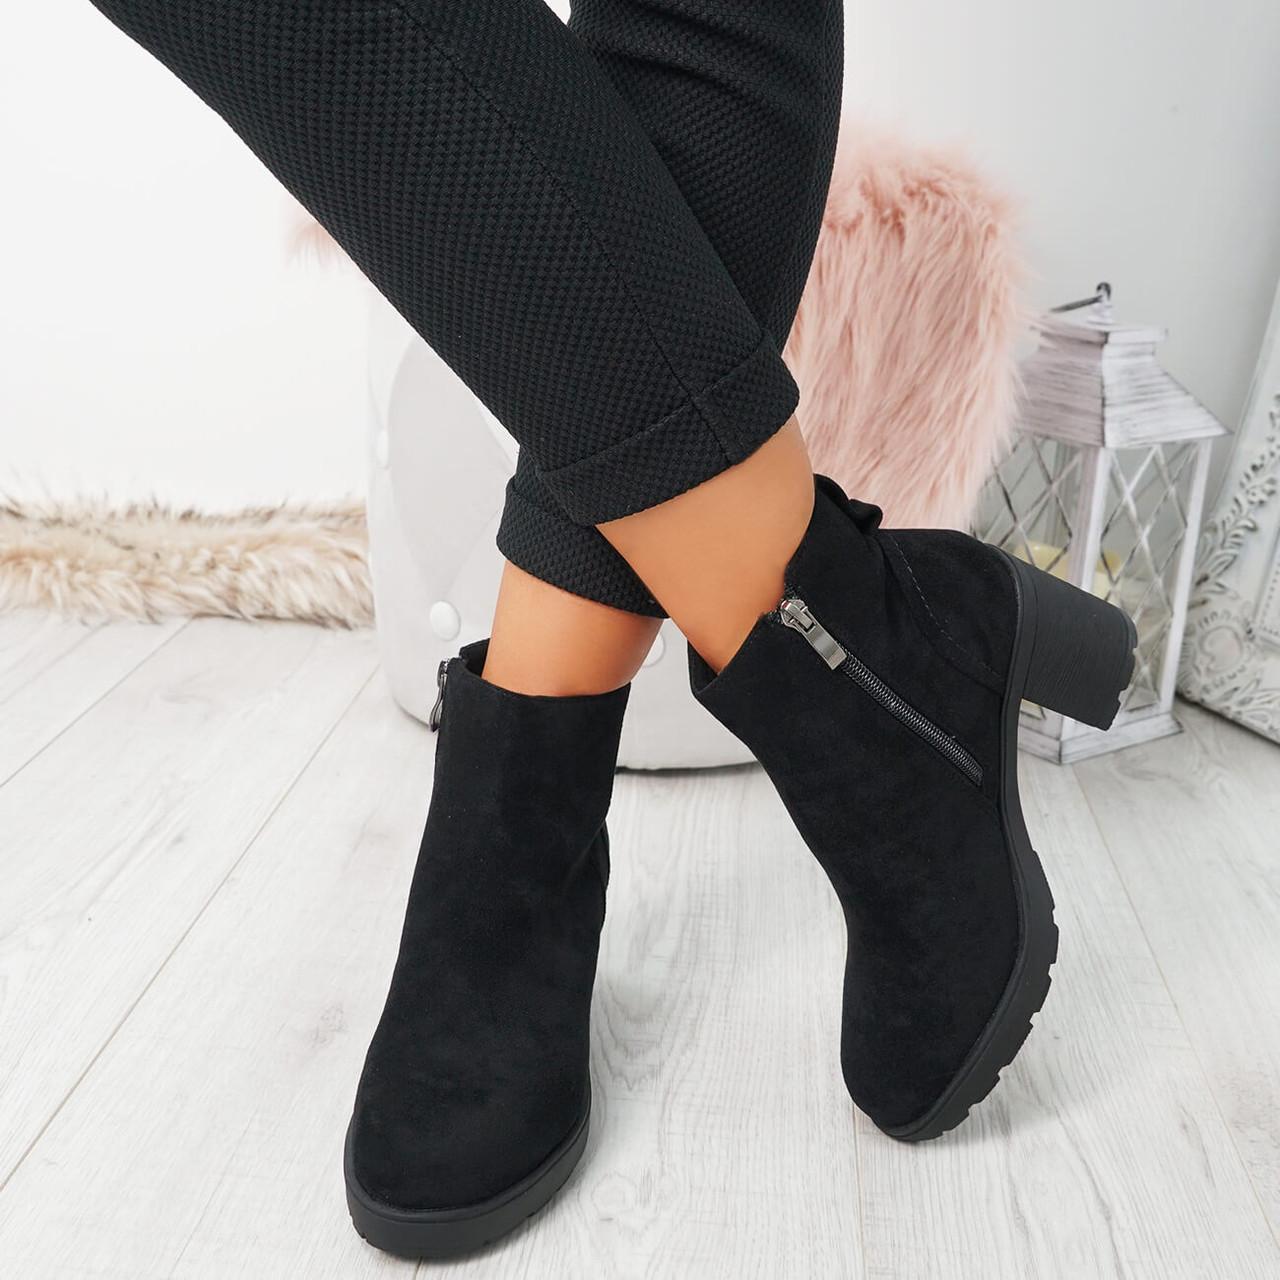 Vaya Black Suede Zip Ankle Boots - Fast